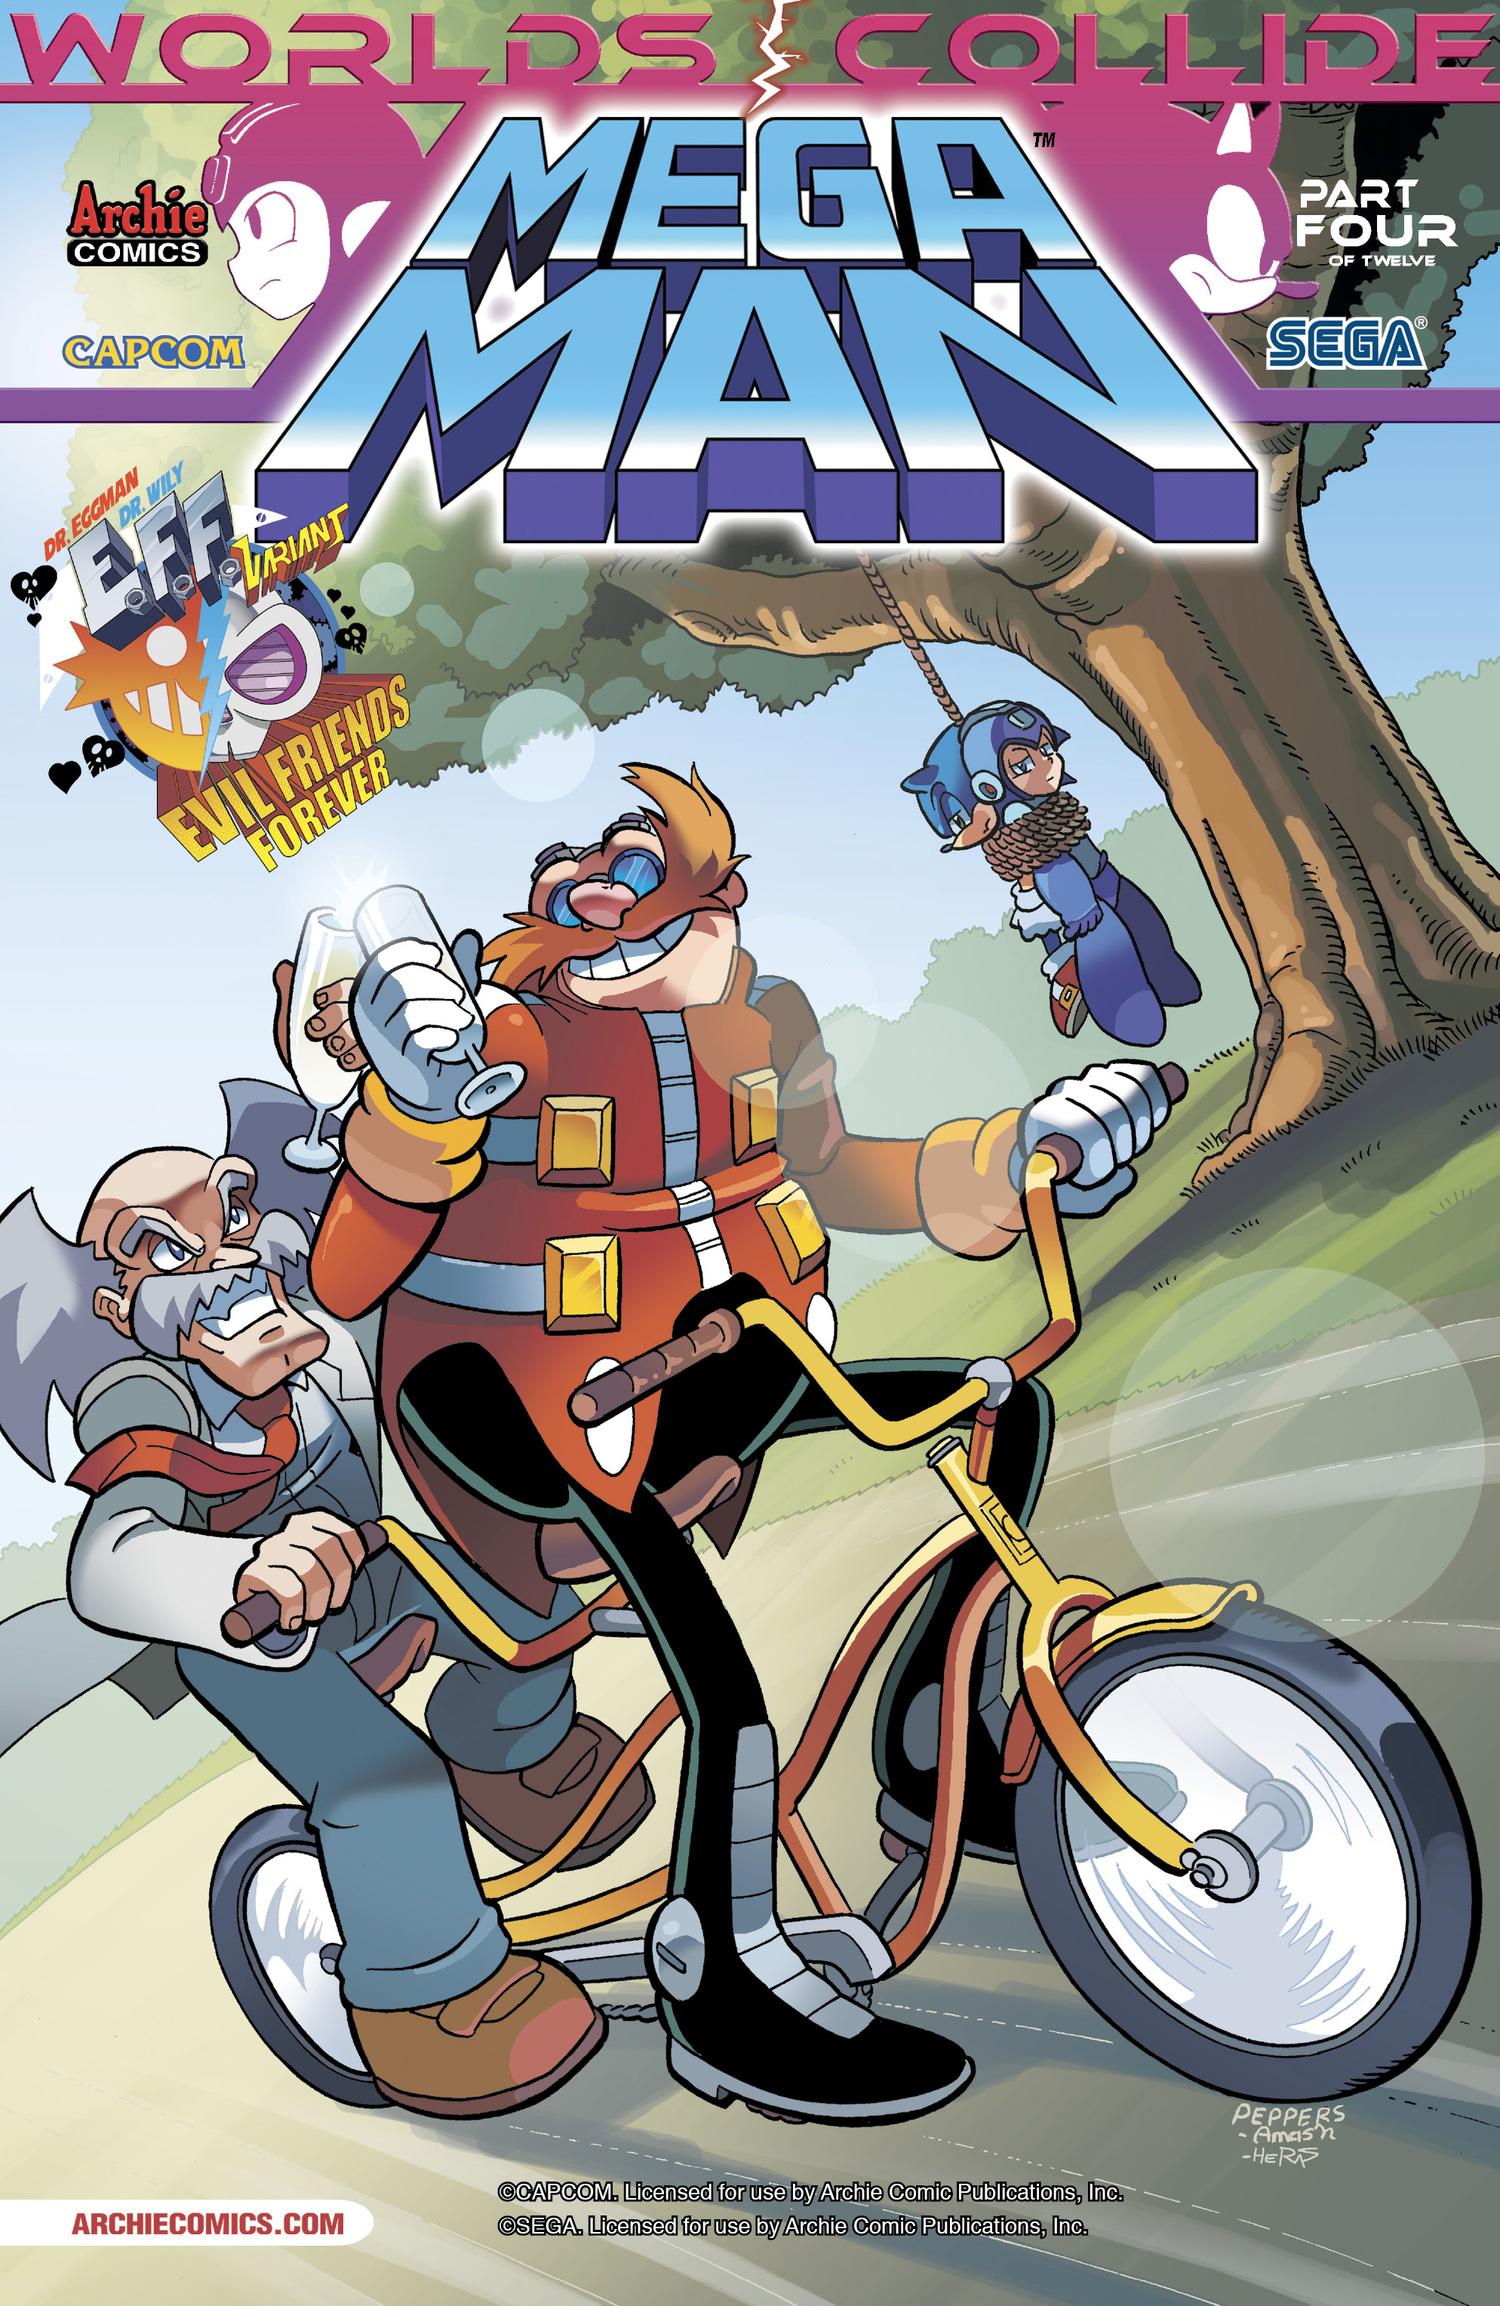 humble archie comics bundle includes all of sonic mega man worlds